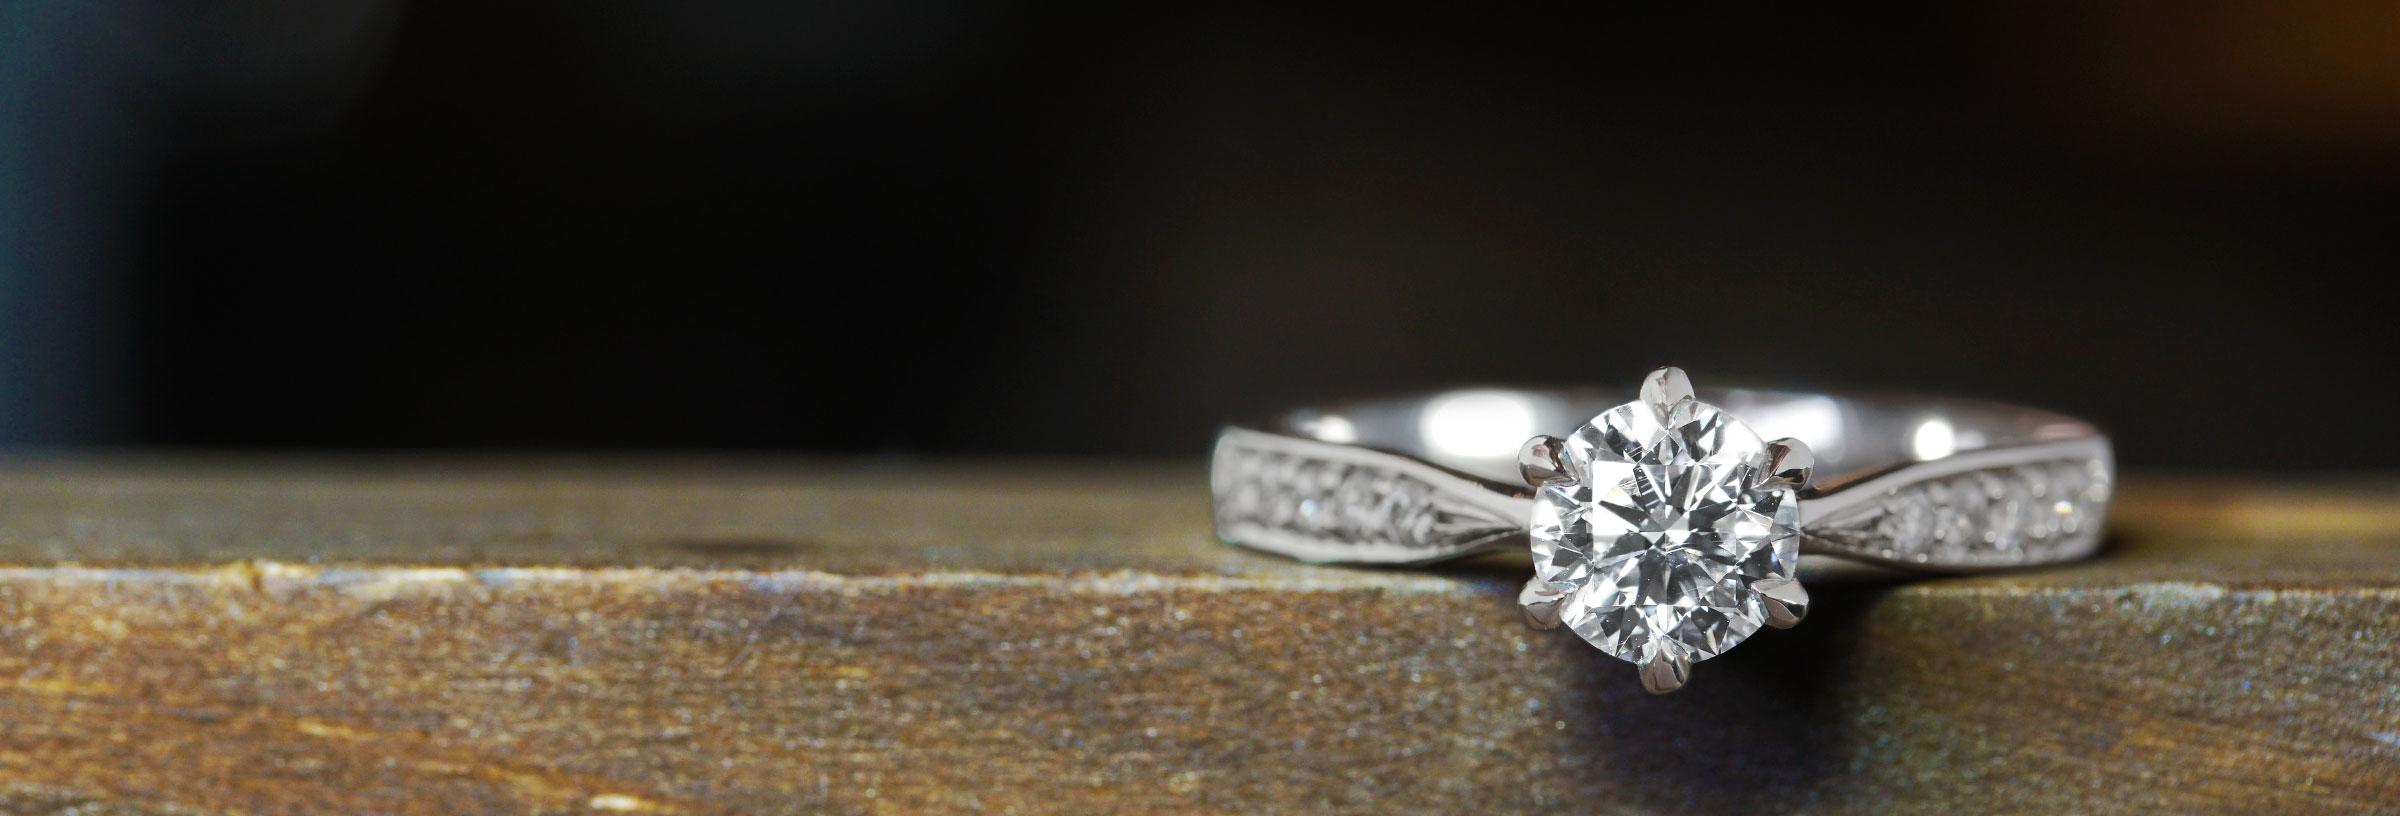 diamond-and-platinum-snowflake-inspired-engagement-ring